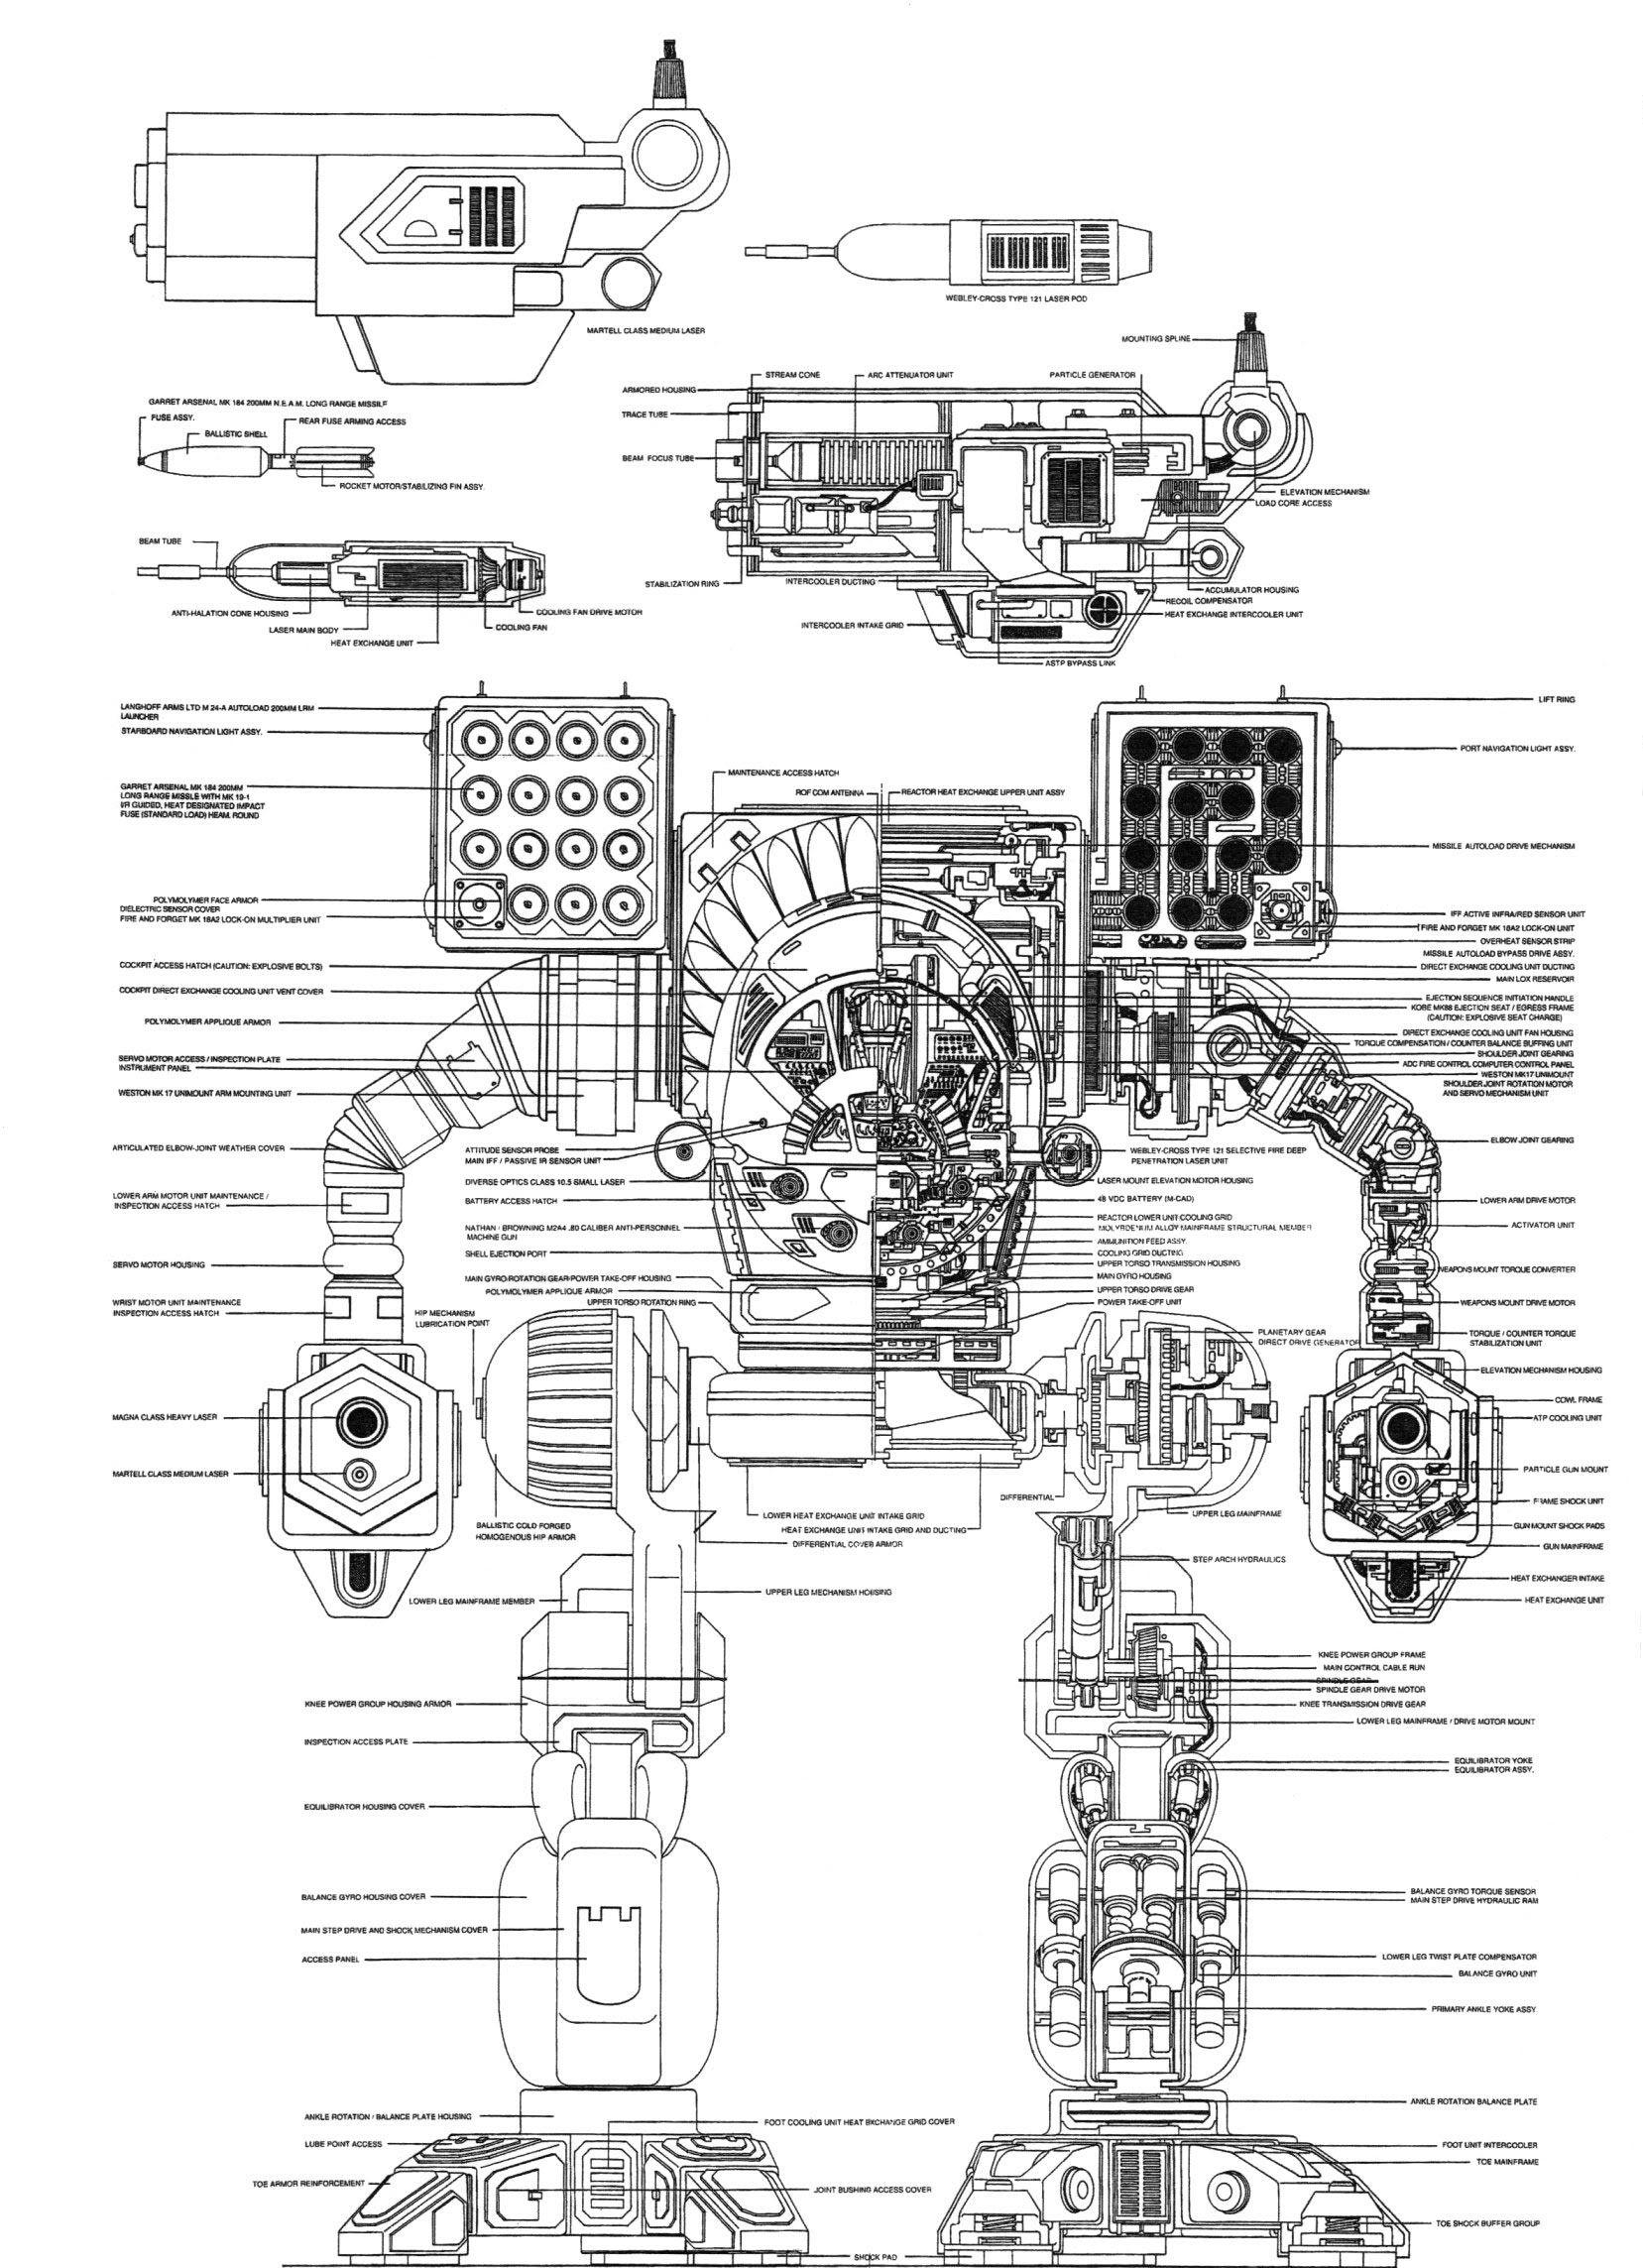 Related Image Mech Blueprints Giant Robots